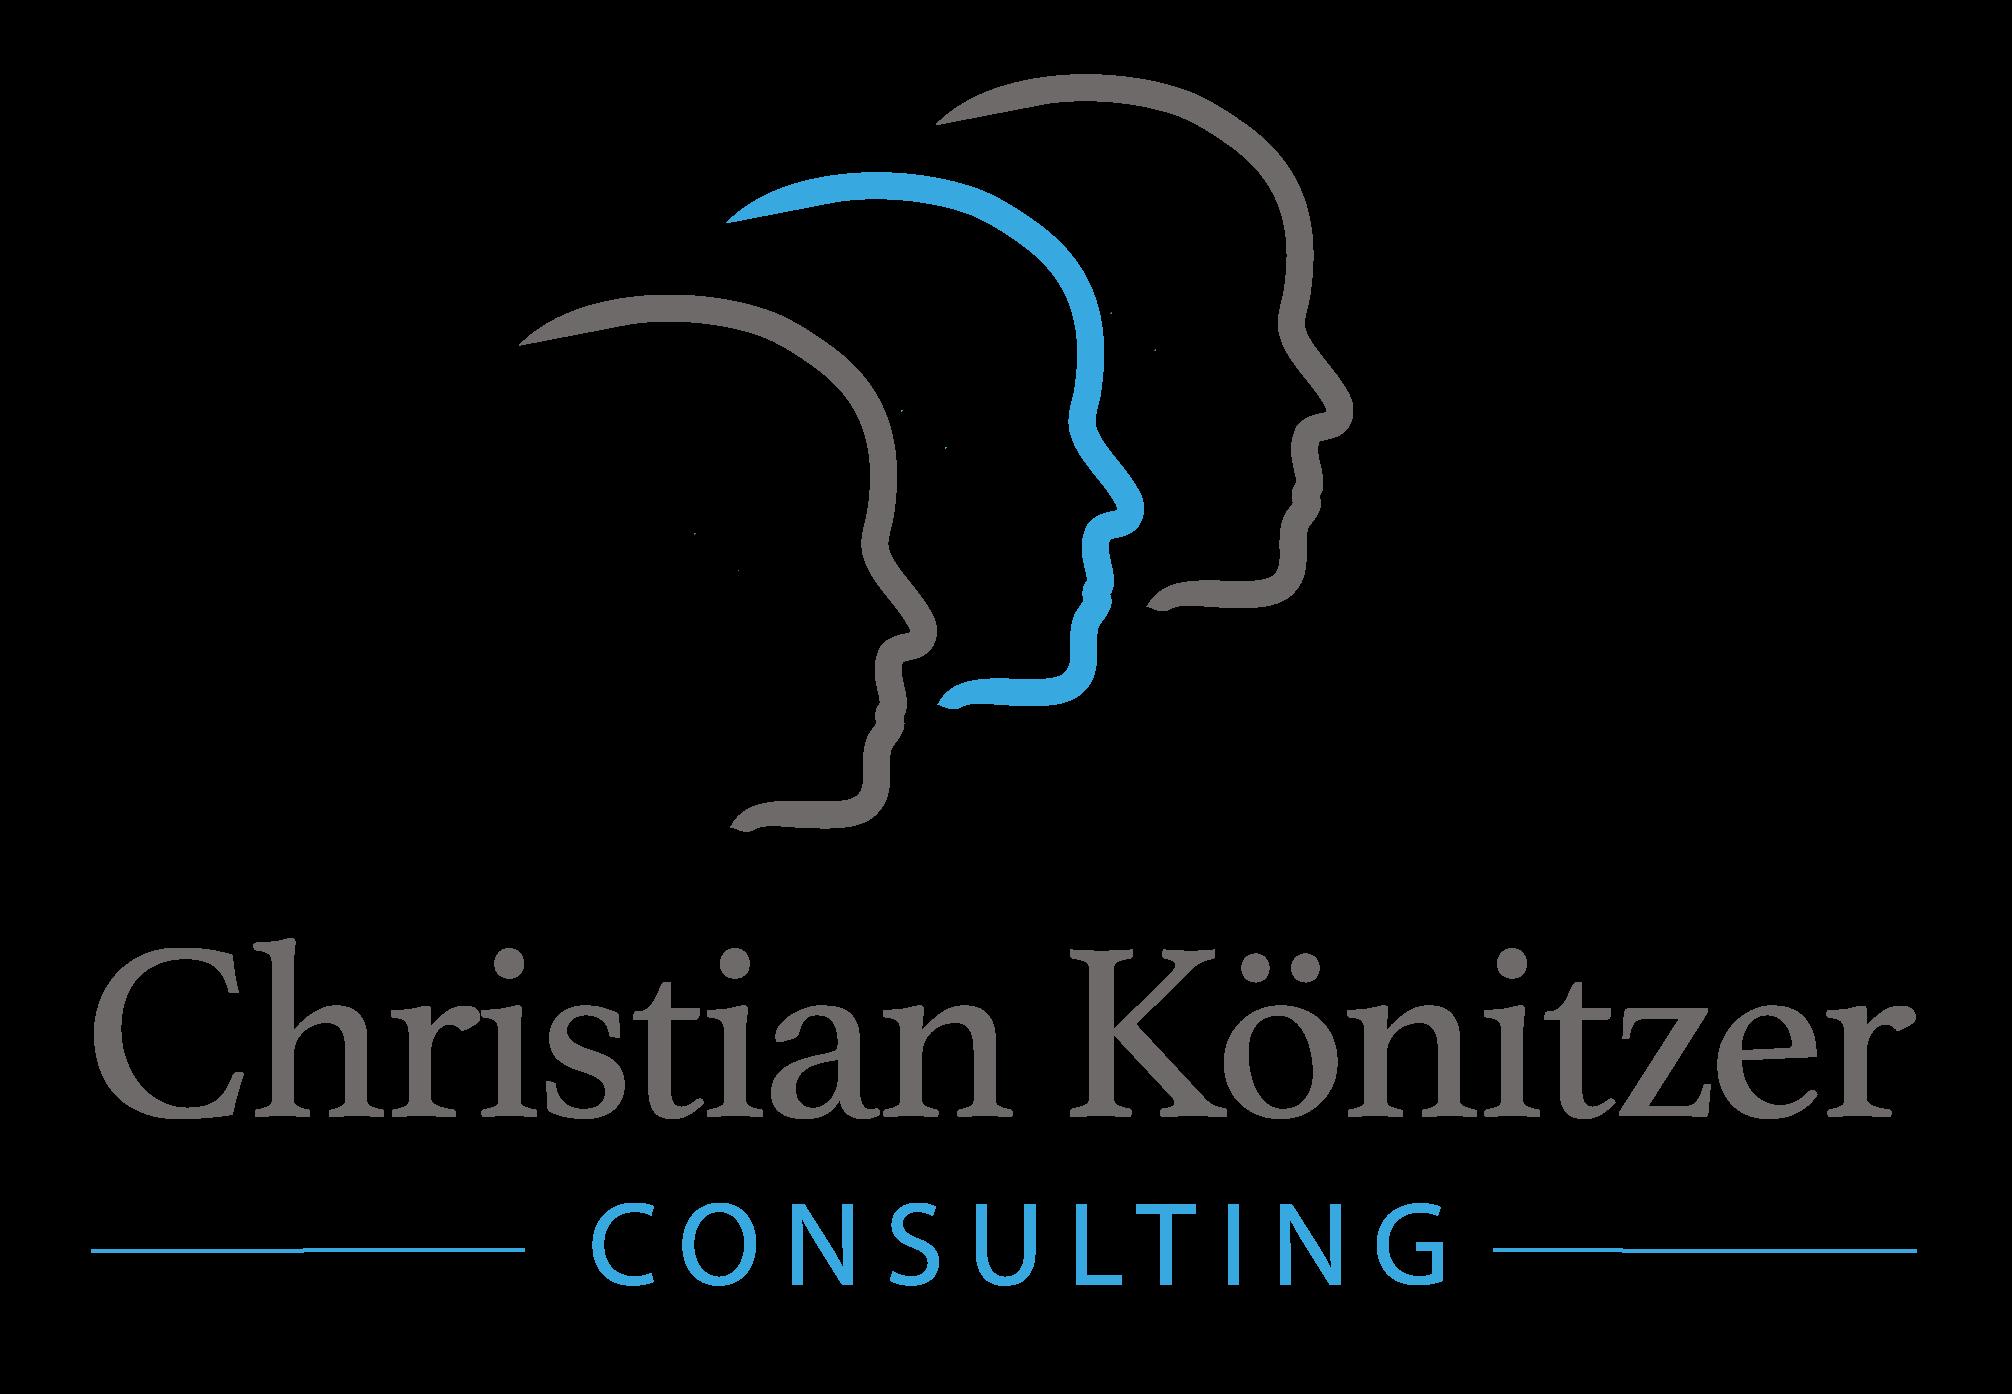 Christian Könitzer Consulting